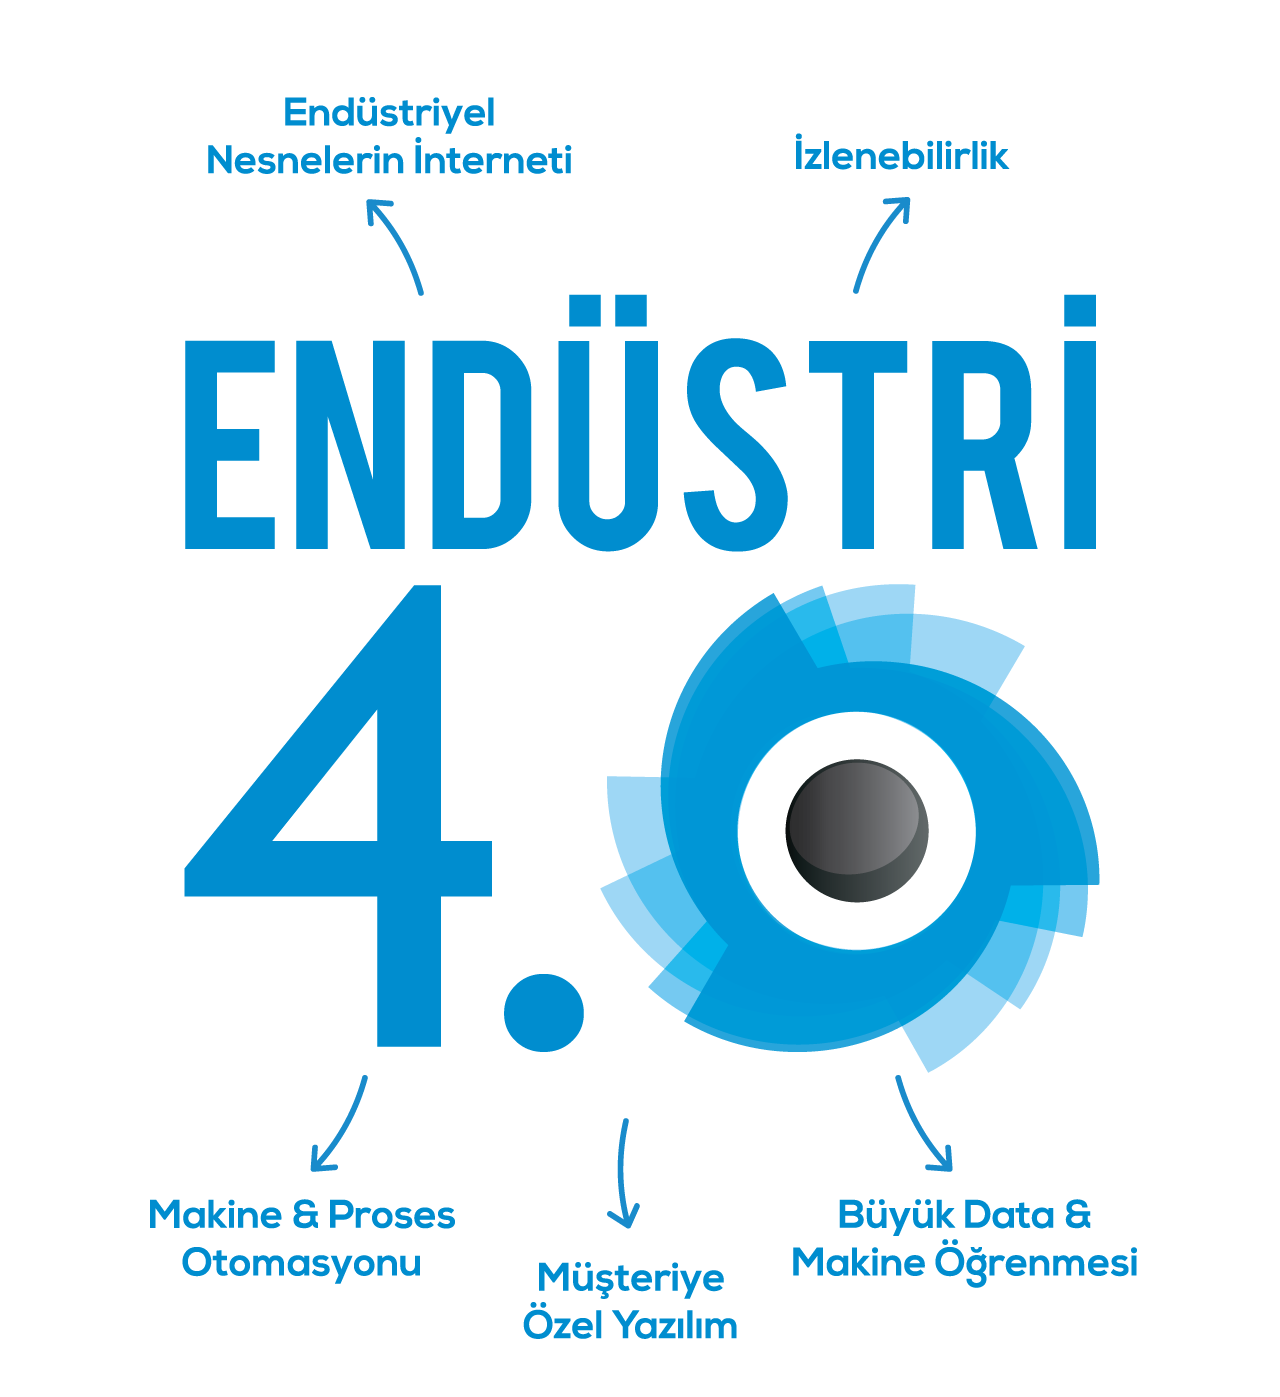 Endustri4.0, industry 4.0, Endustri 4.0 , IOT, iiot, Machine_Learning, Siskon , Siskon_Otomasyon, Siskon_Yazilim, Akilli_Fabrika, Ev_Otomasyonu